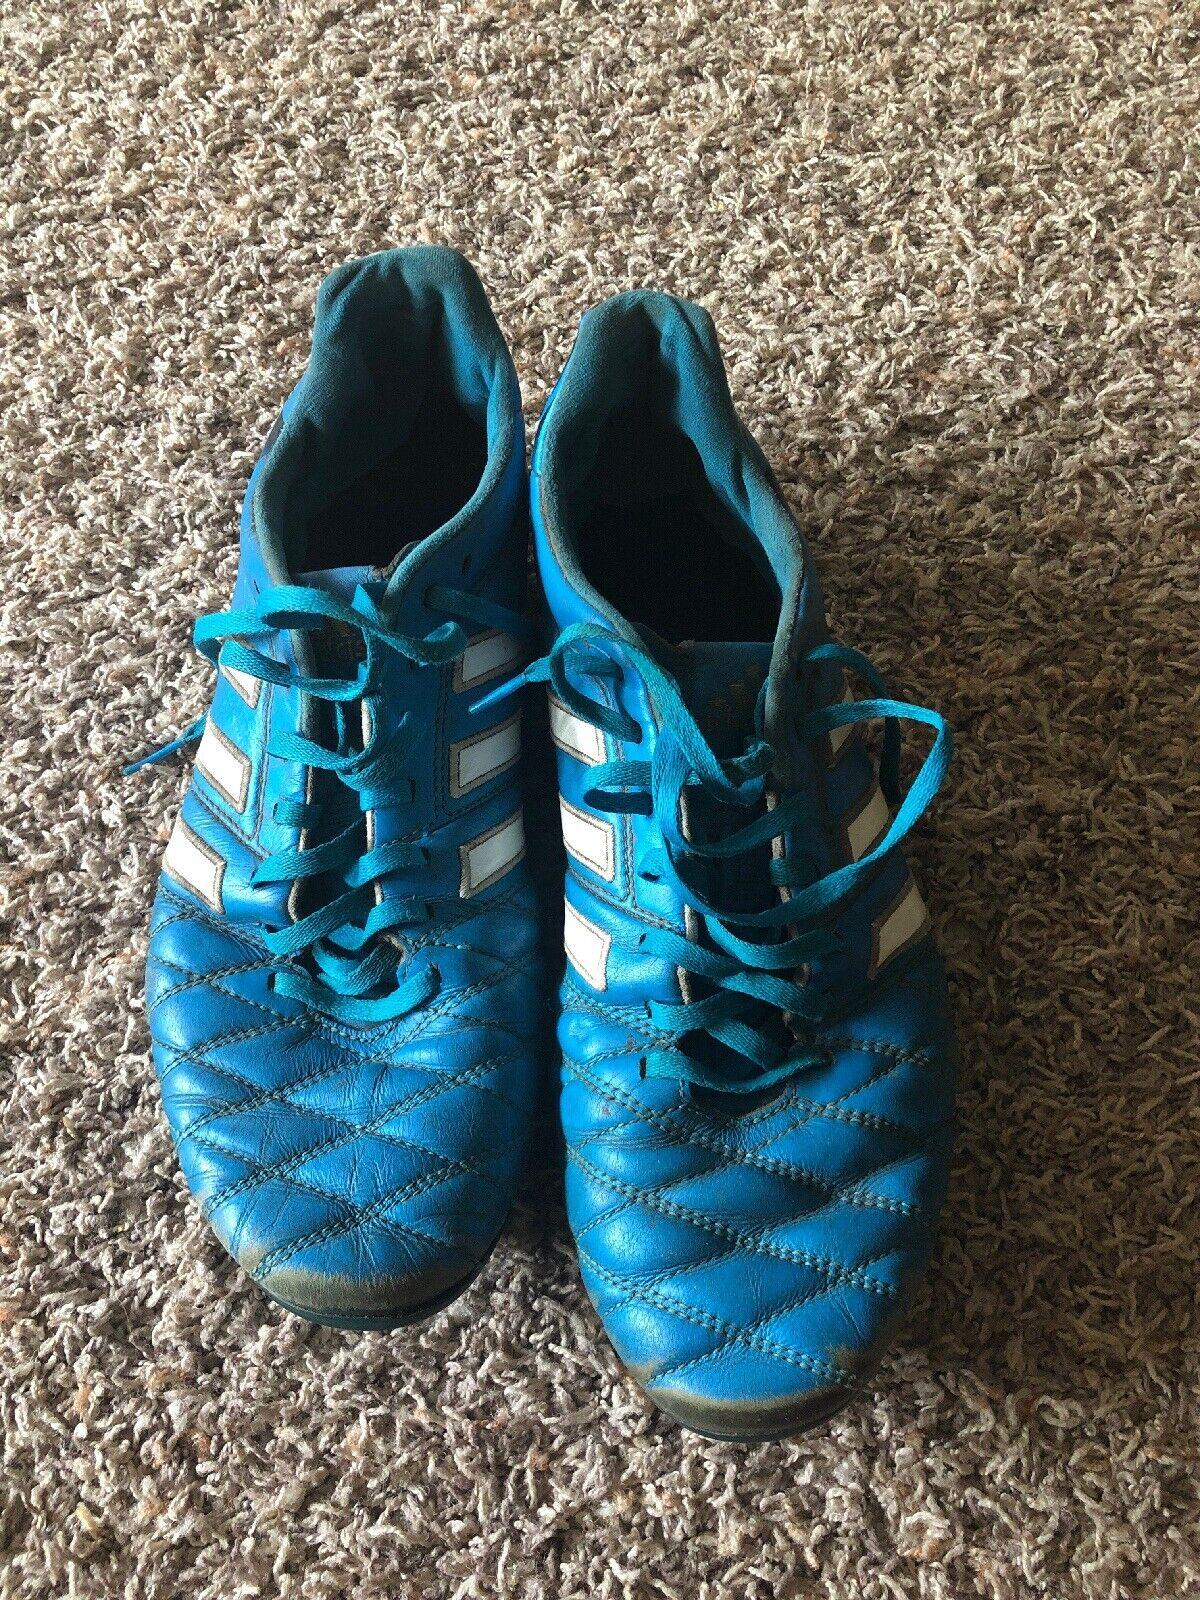 Adidas Adipure 11pro Soft Ground blu e bianca Soccer Cleats uomini's Diuominiione 10.5